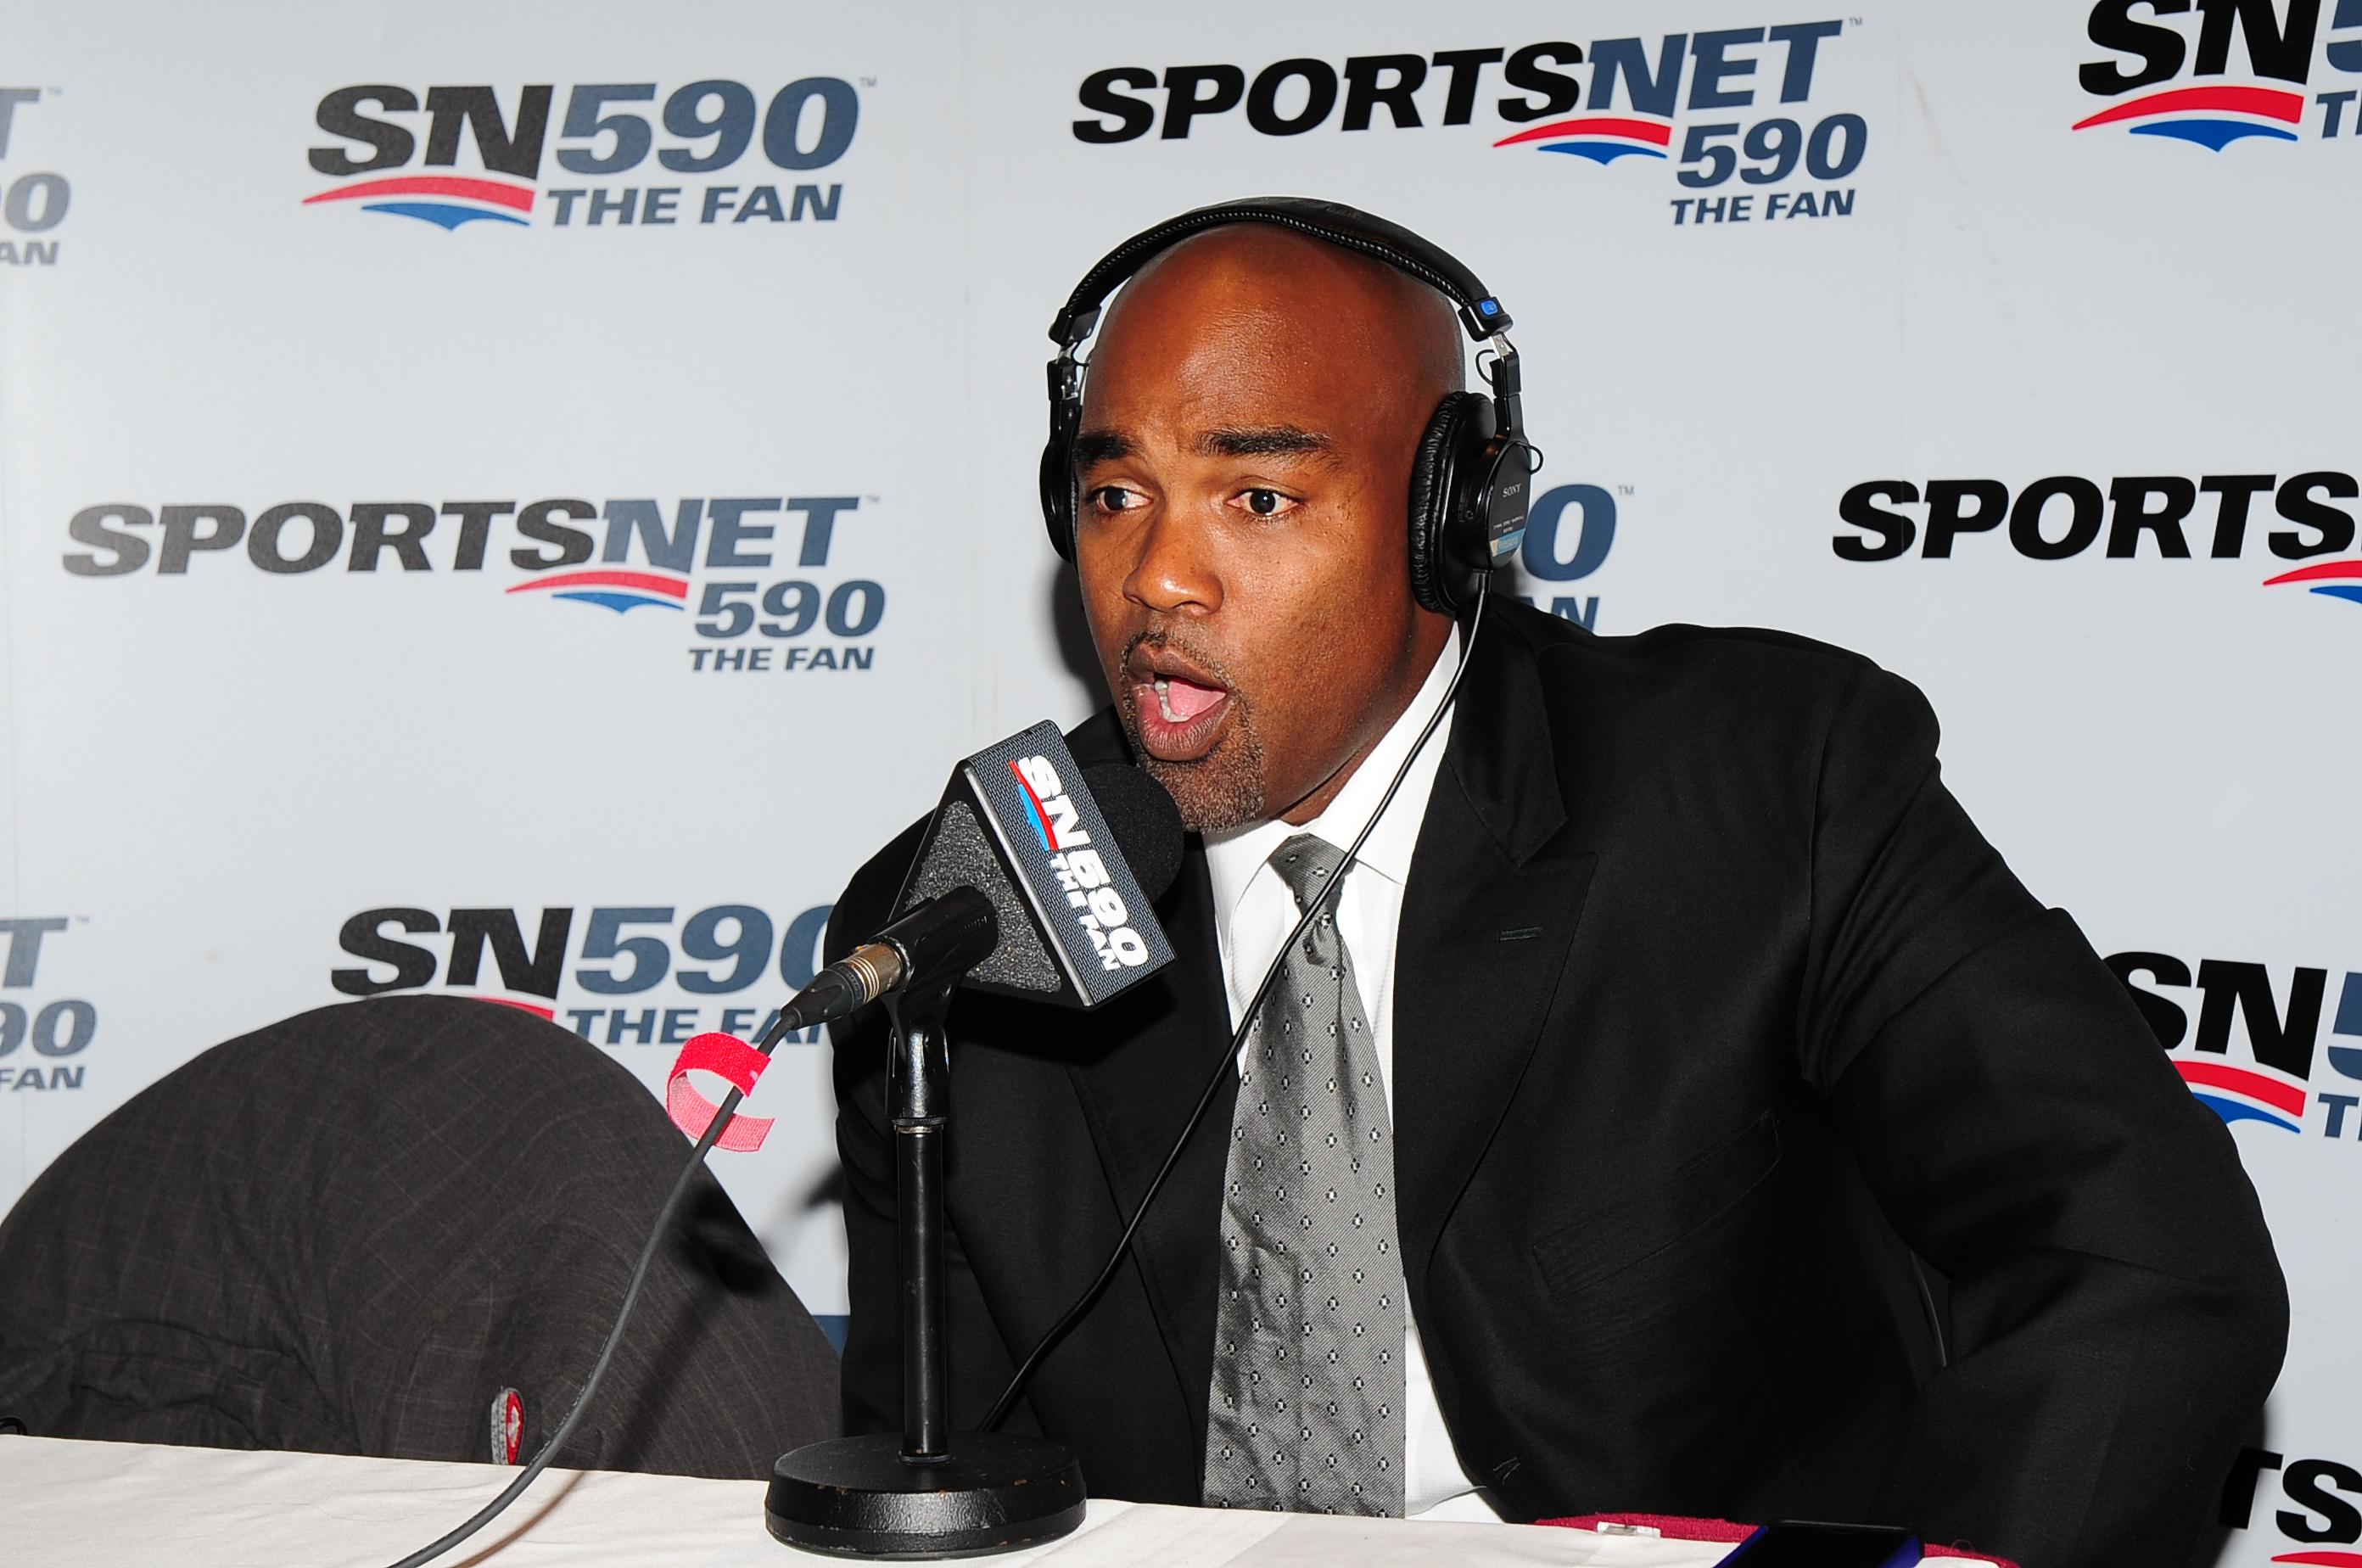 Carlos Delgado – Sportsnet interview | Conn Smythe Sports